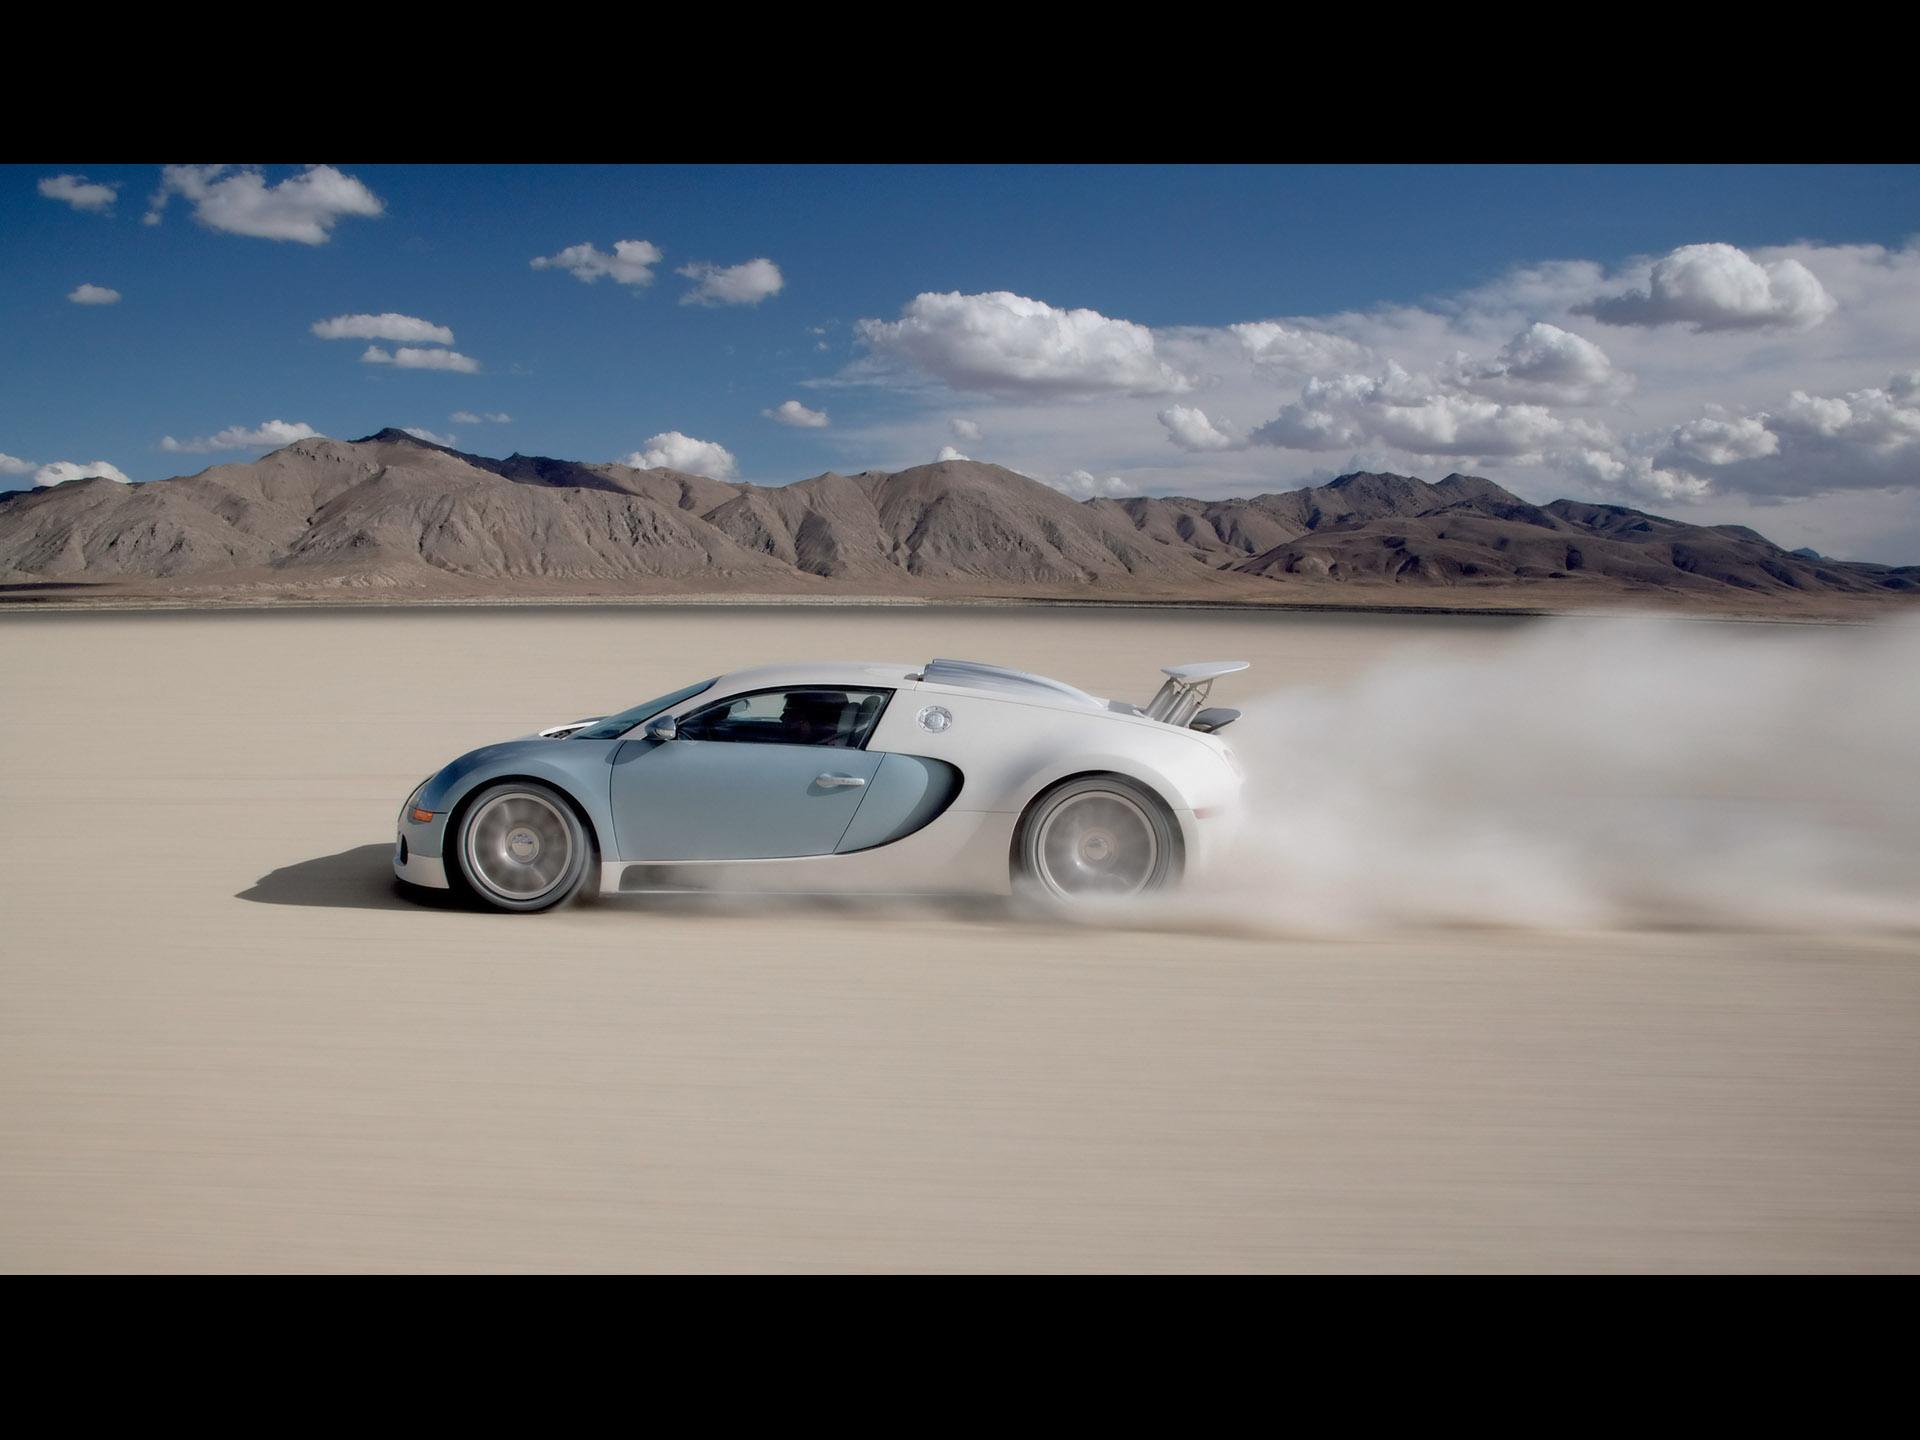 Bugatti Veyron W16 Engine Cutaway Diagram Targa Florio Salt Flats 1920x1440